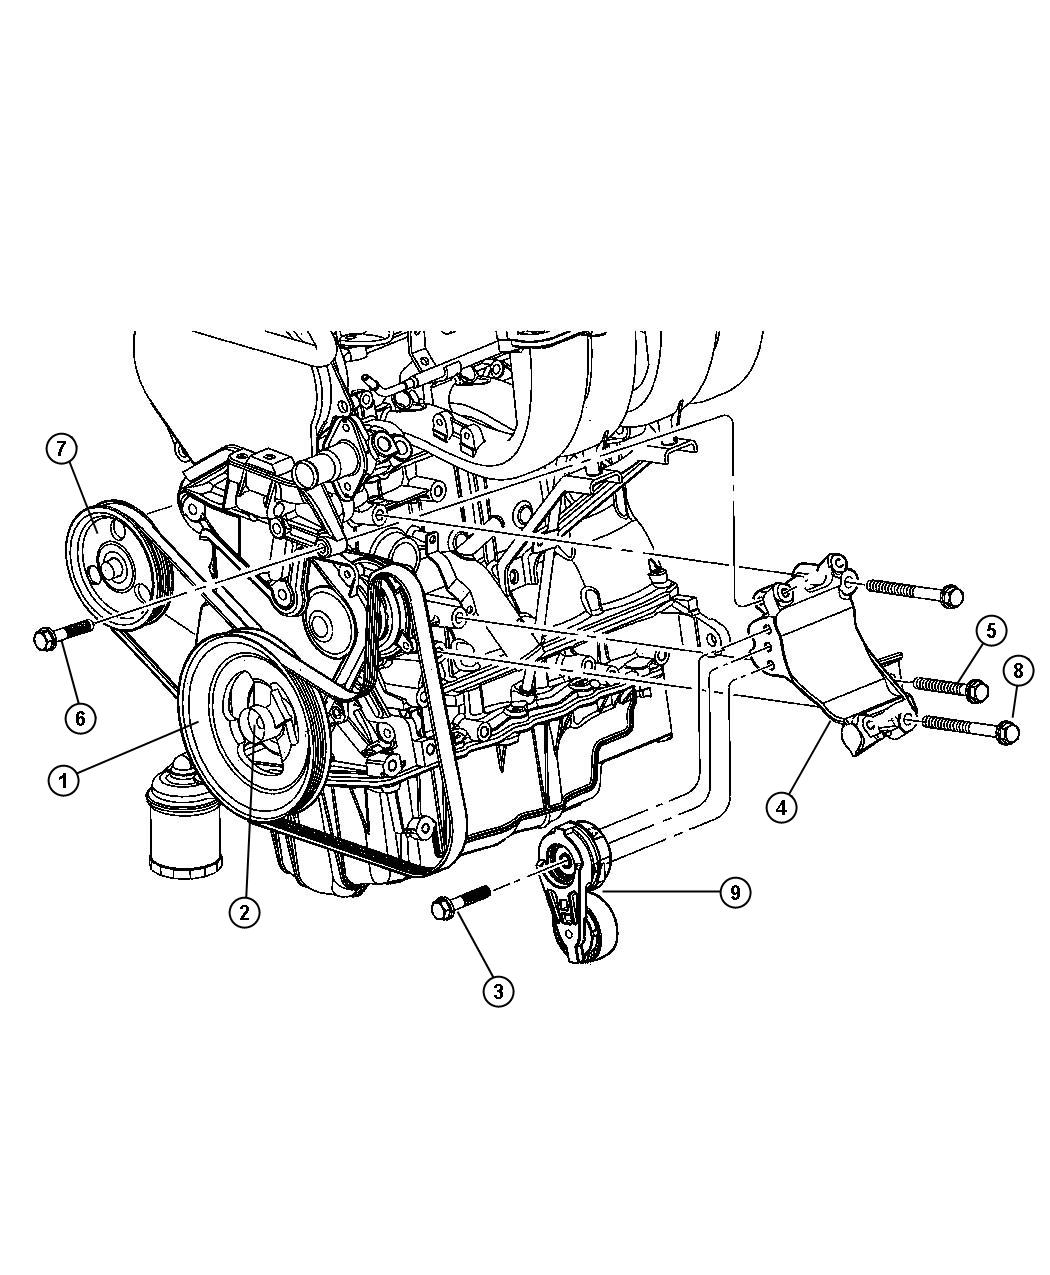 Jeep Liberty Damper Engine Vibration Ecm